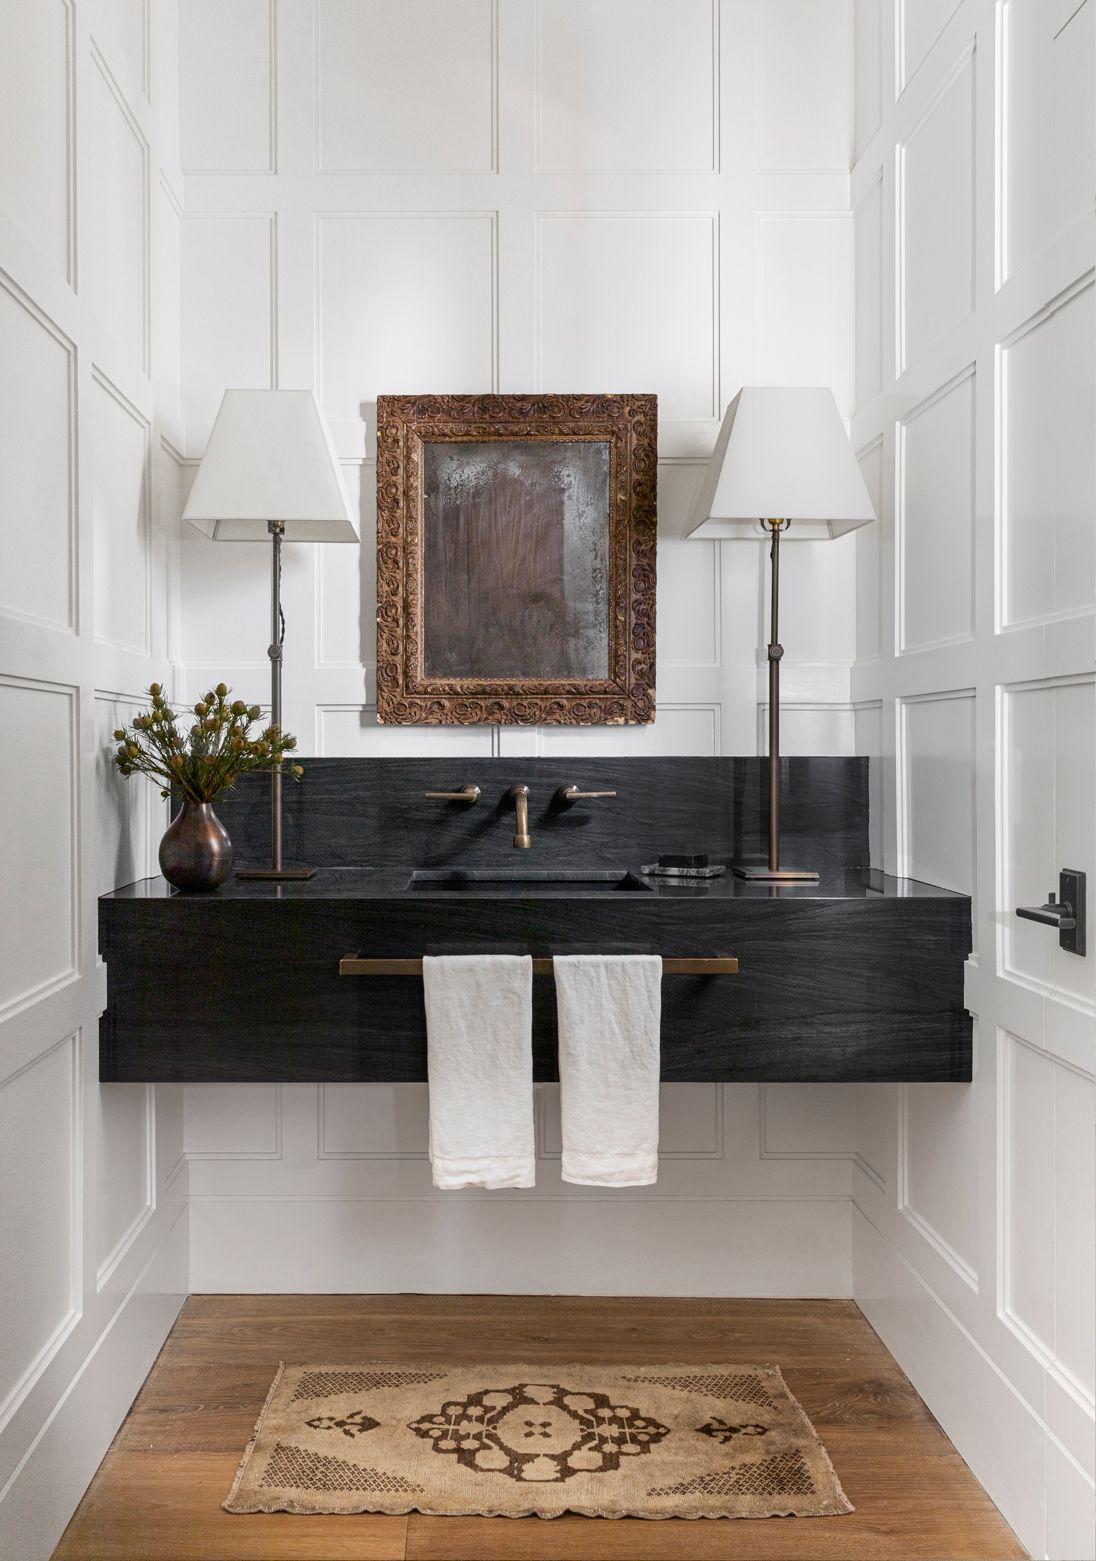 85 Small Bathroom Decor Ideas How To, Small Bathroom Decorating